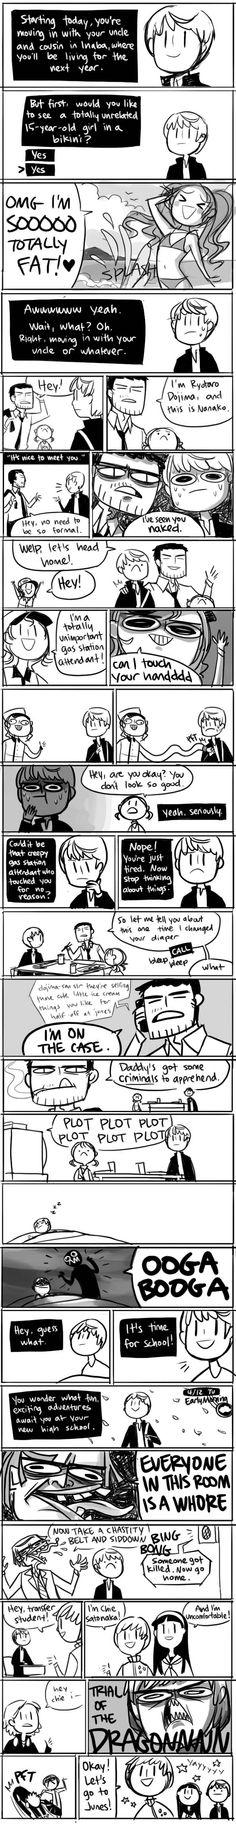 Hiimdaisy's Persona 4 comic (Warning: VERY LONG) - Album on Imgur